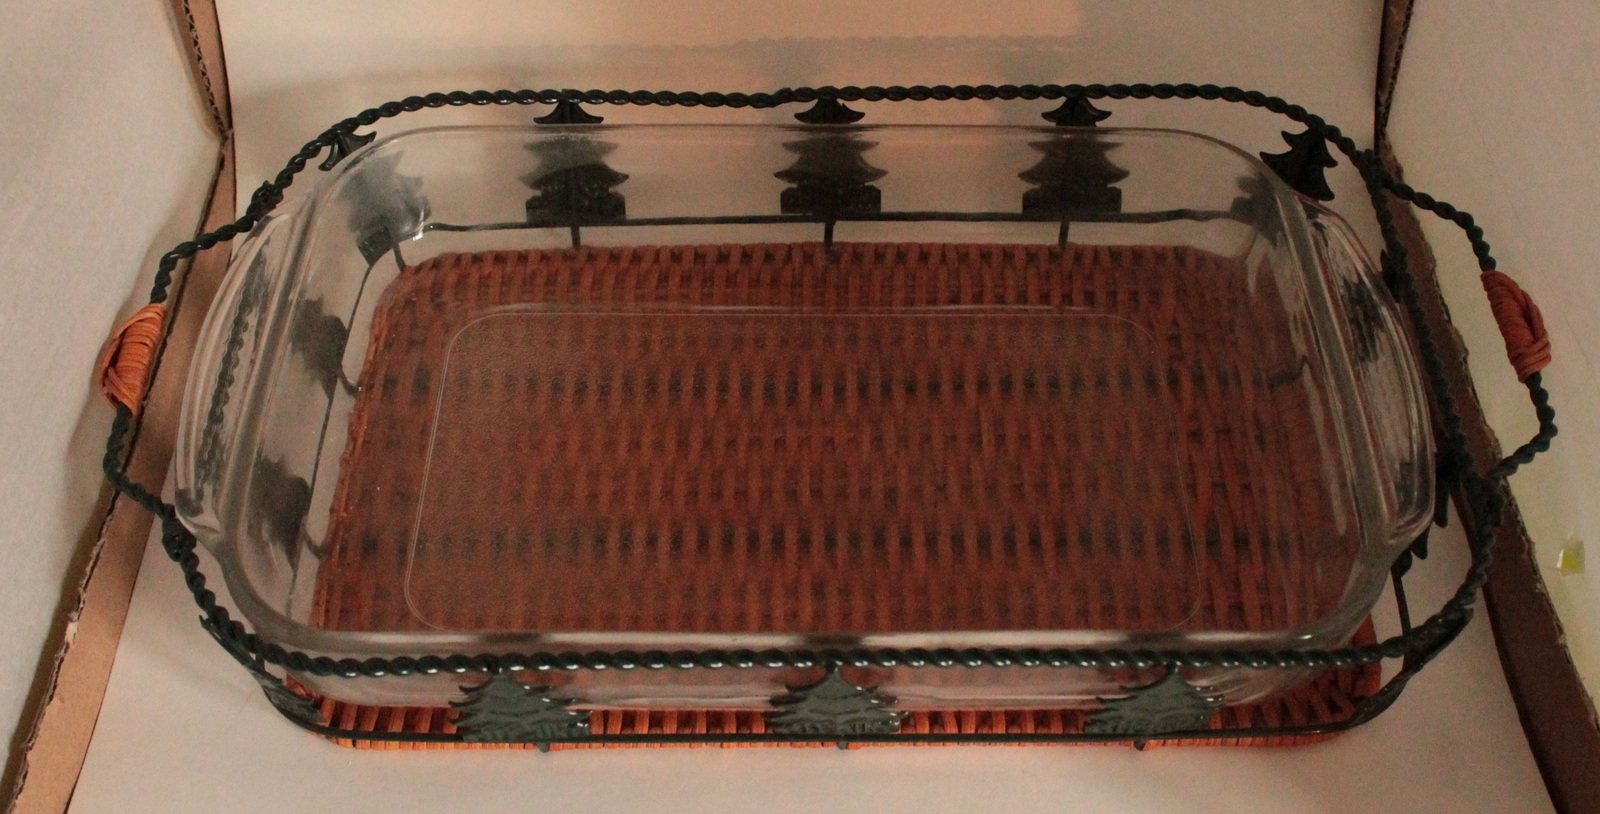 037 037 Vintage Pyrex Christmas Pine Tree Casserole Carrier